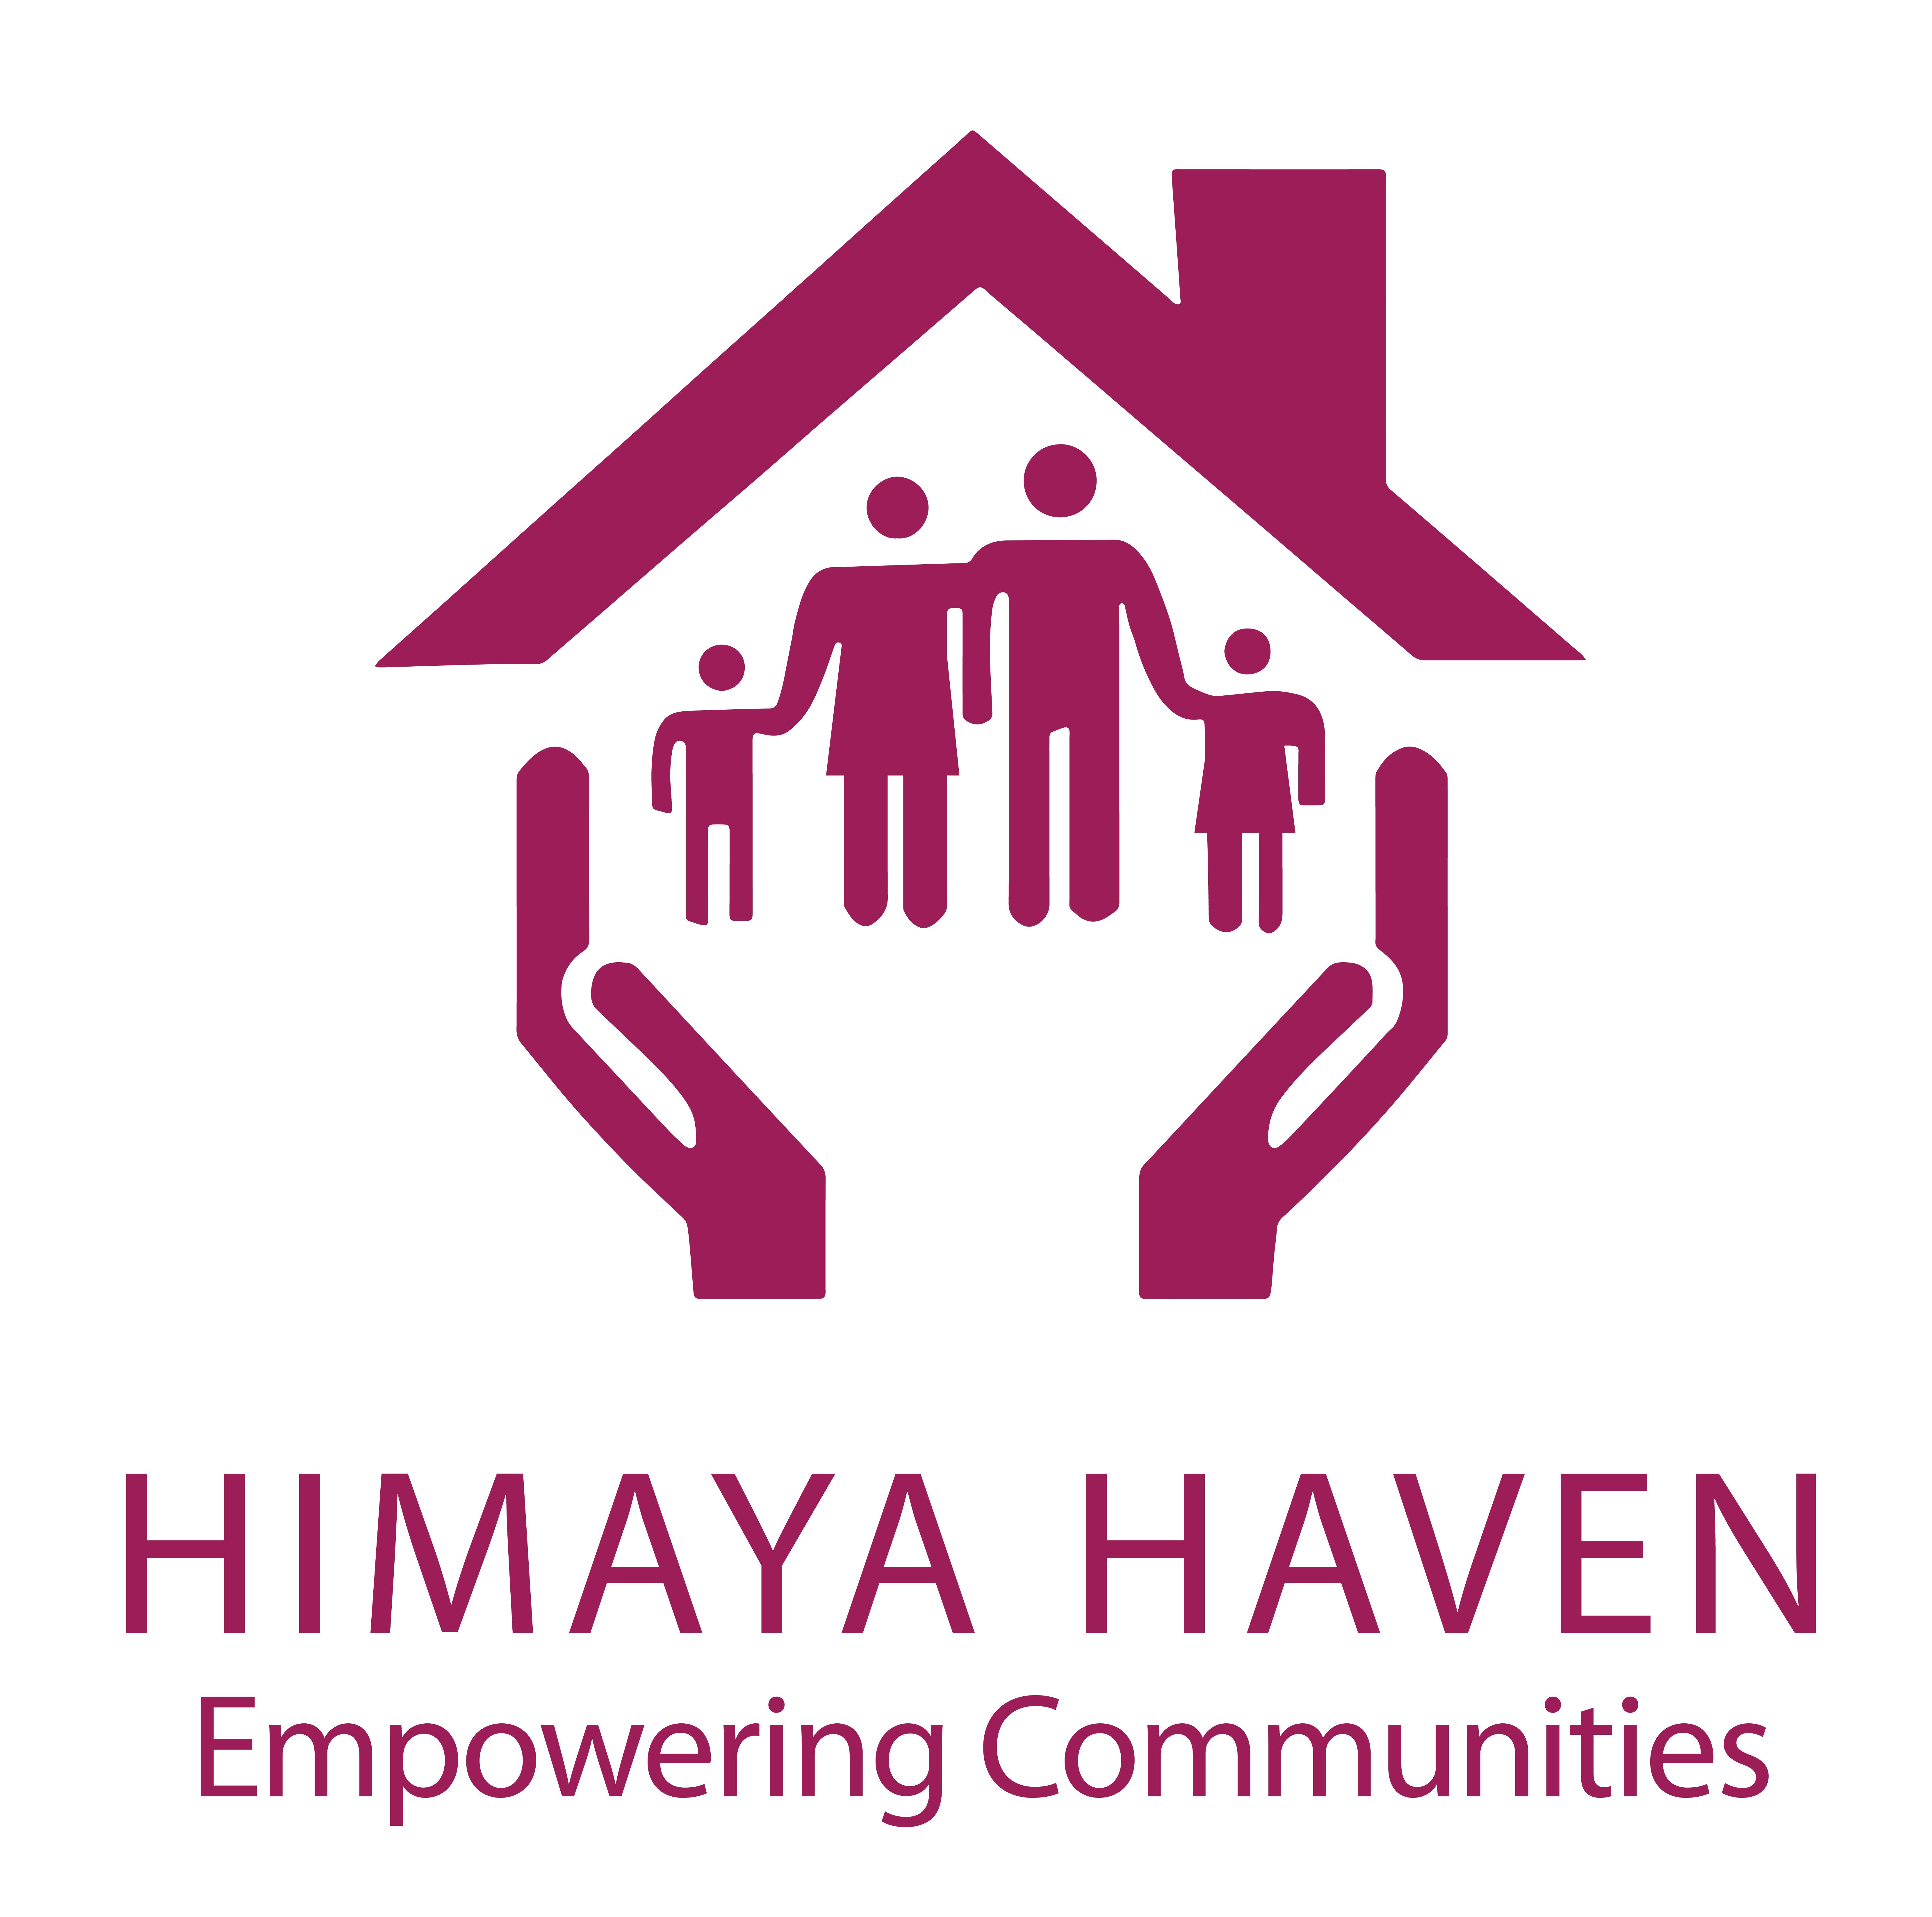 Himaya Haven